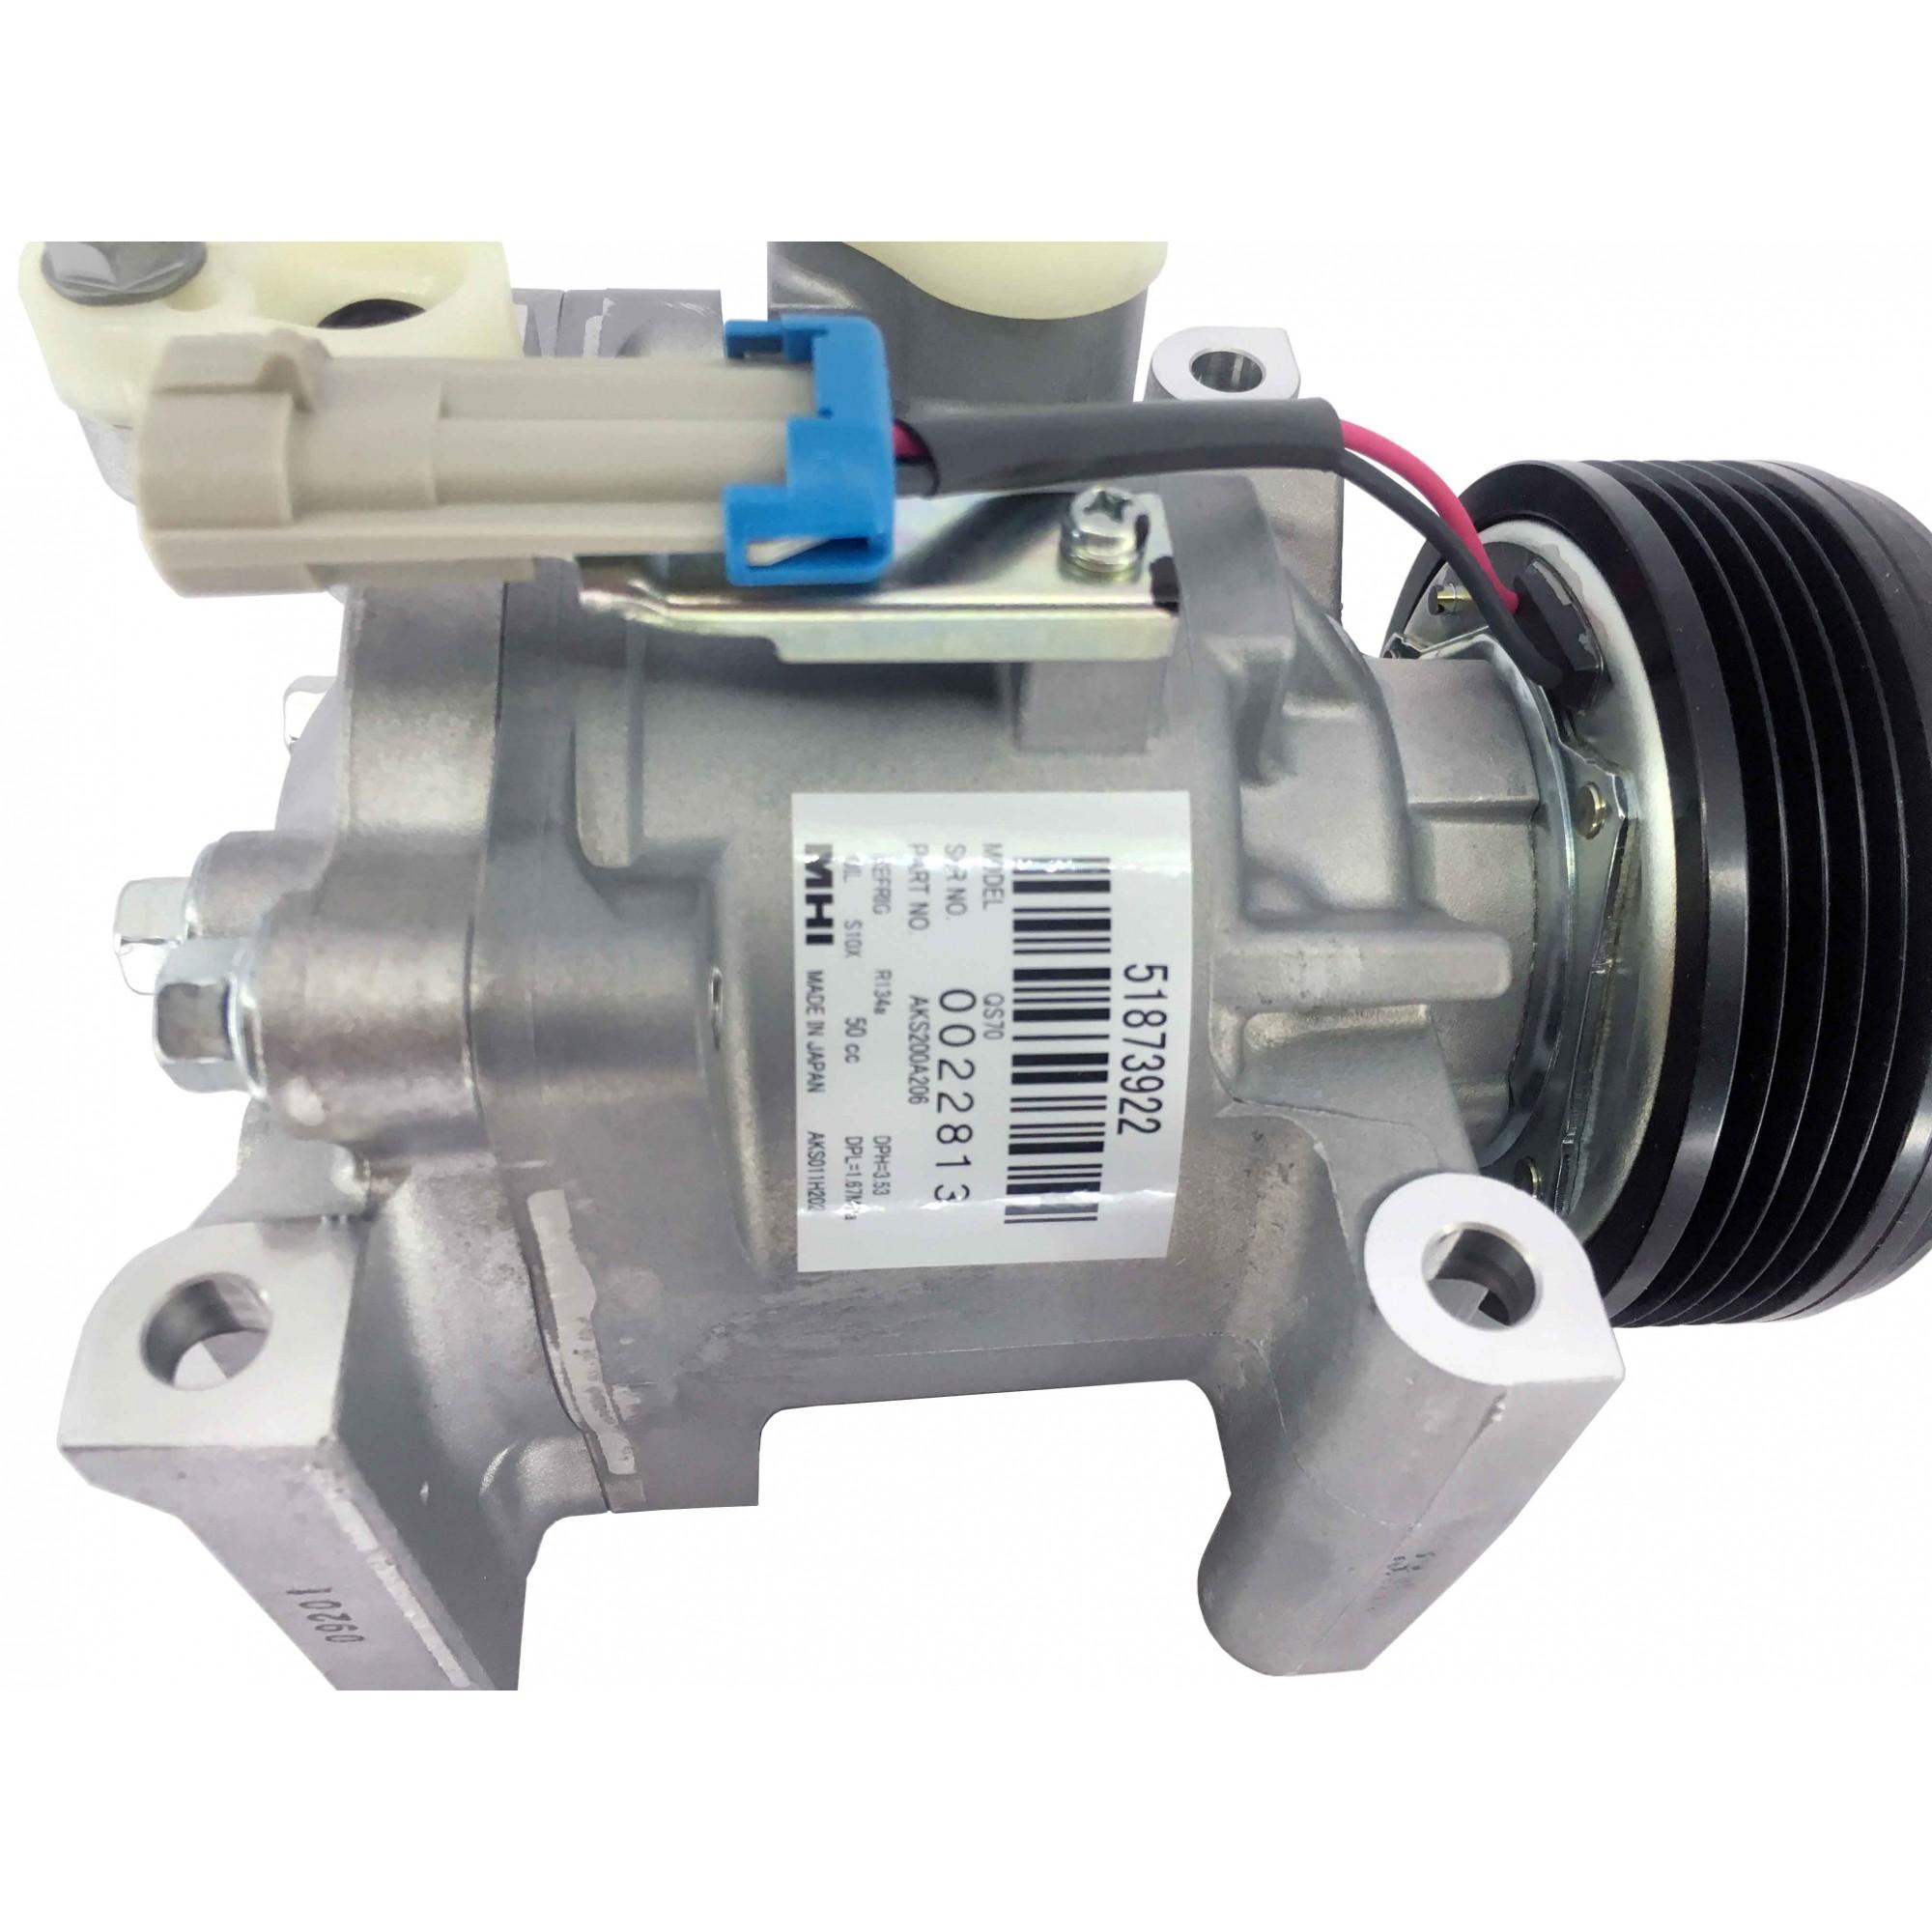 Compressor Grand Siena  / Doblô / Bravo T-jet - Tetra-Fuel